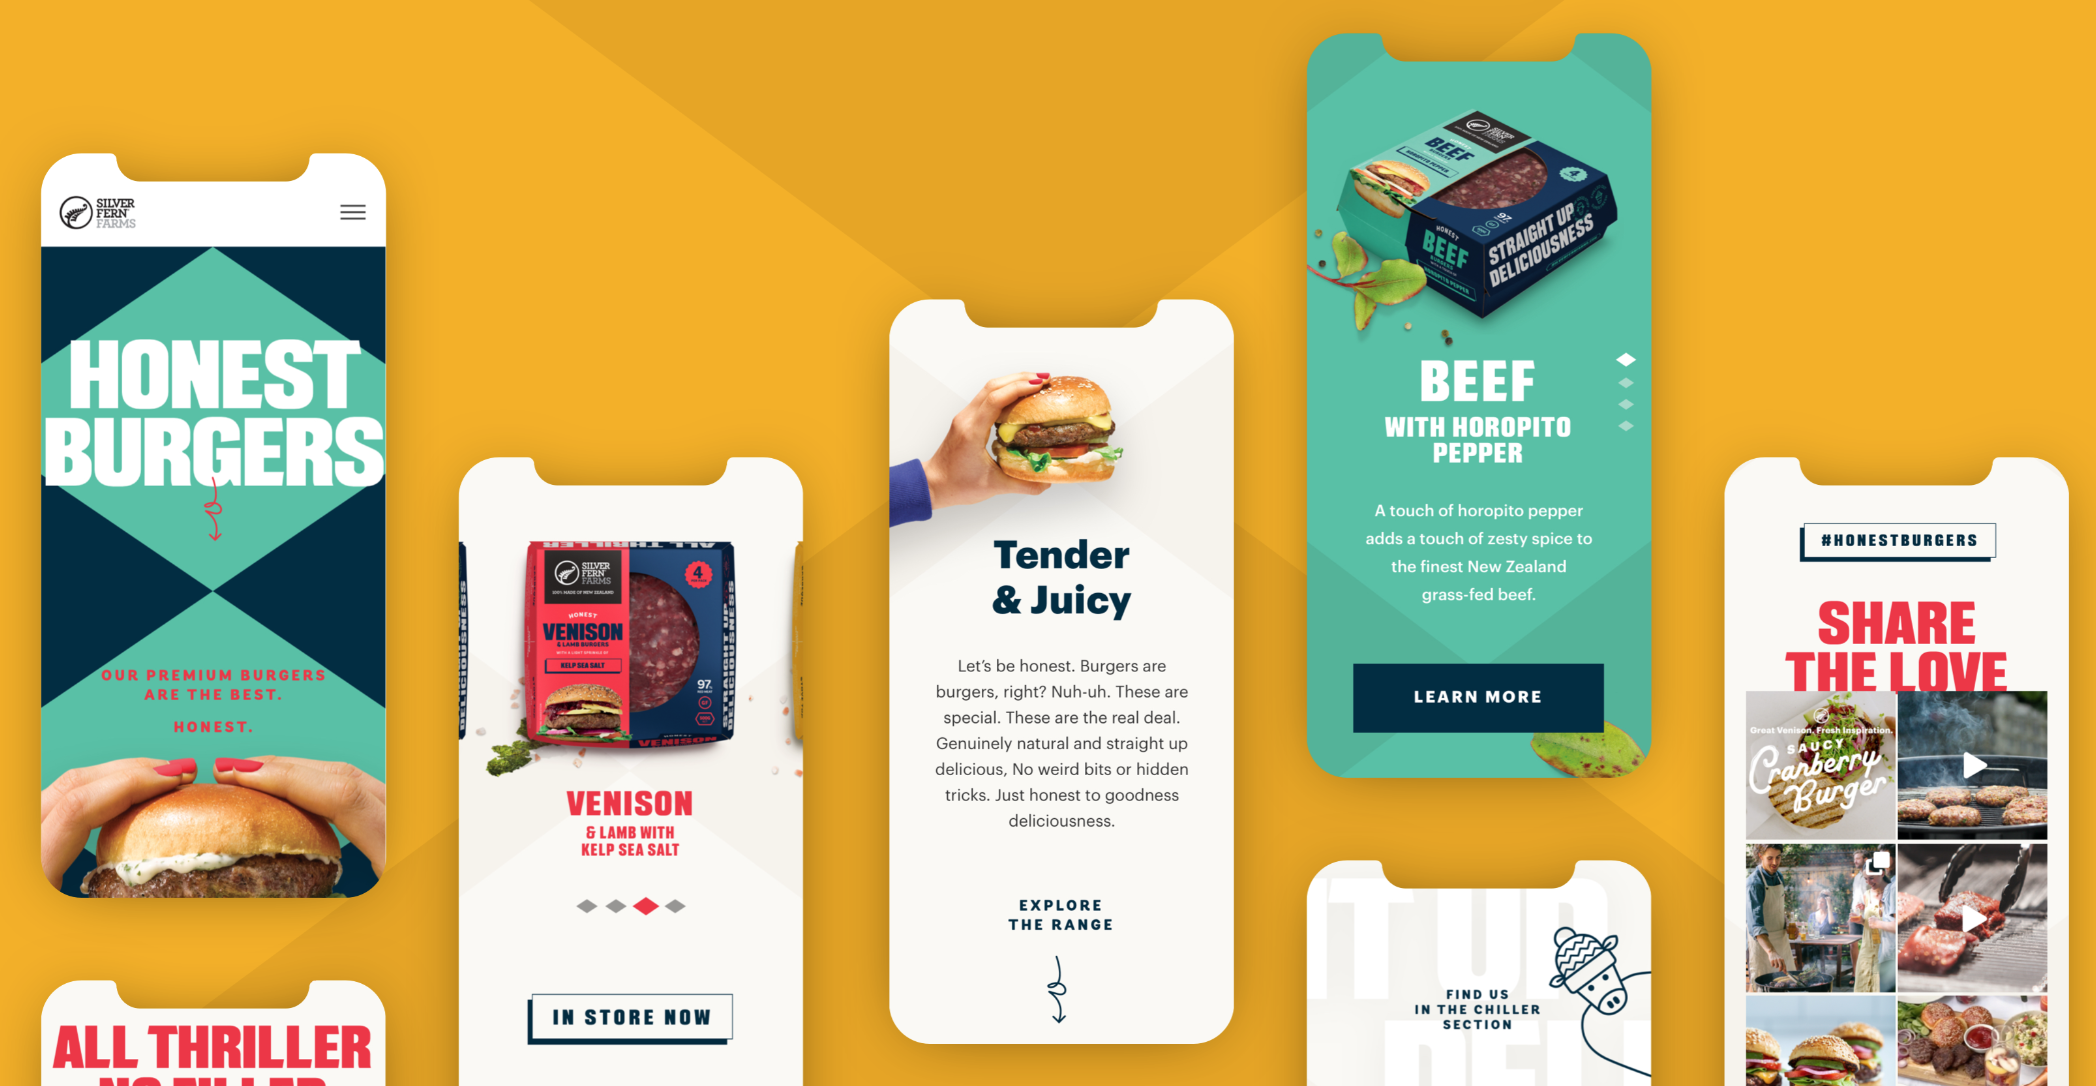 silver-fern-farms-honest-burgers-design-works-silverstripe-animation-mobile-display.png#asset:1300